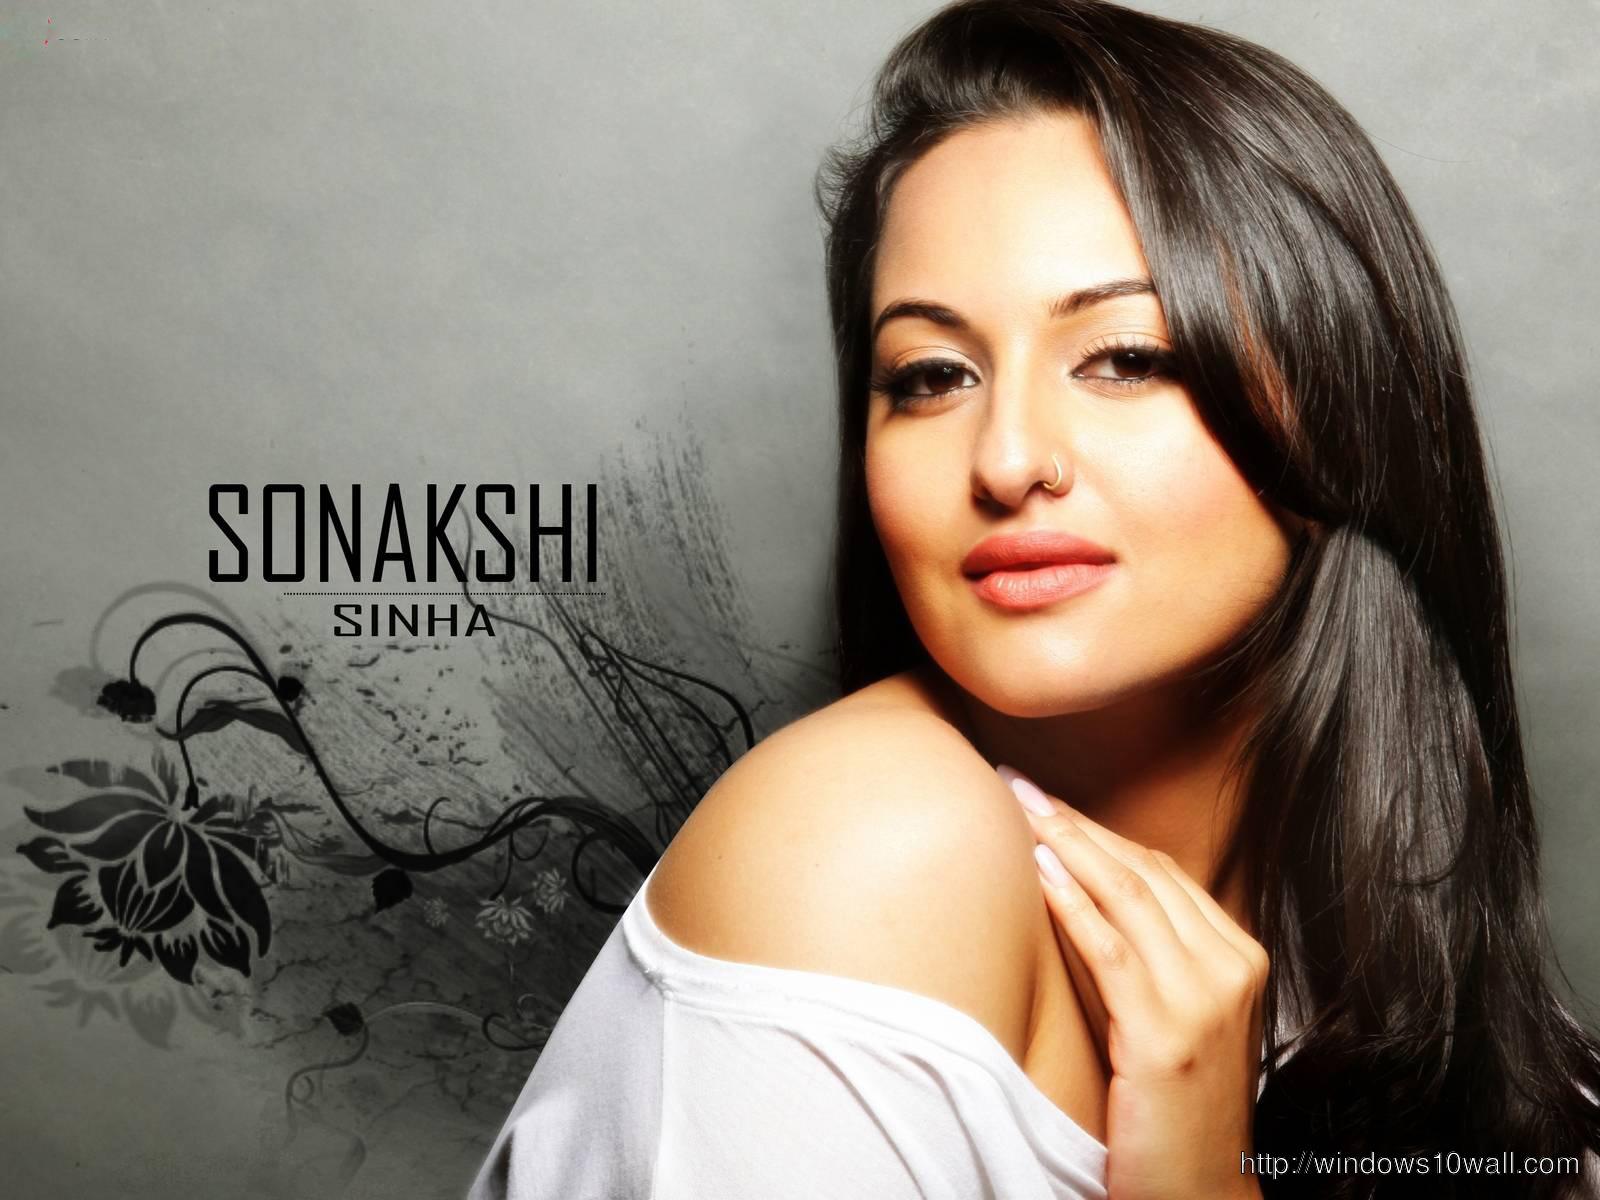 Beautiful-Actress-Sonakshi-Sinha-Wallpaper